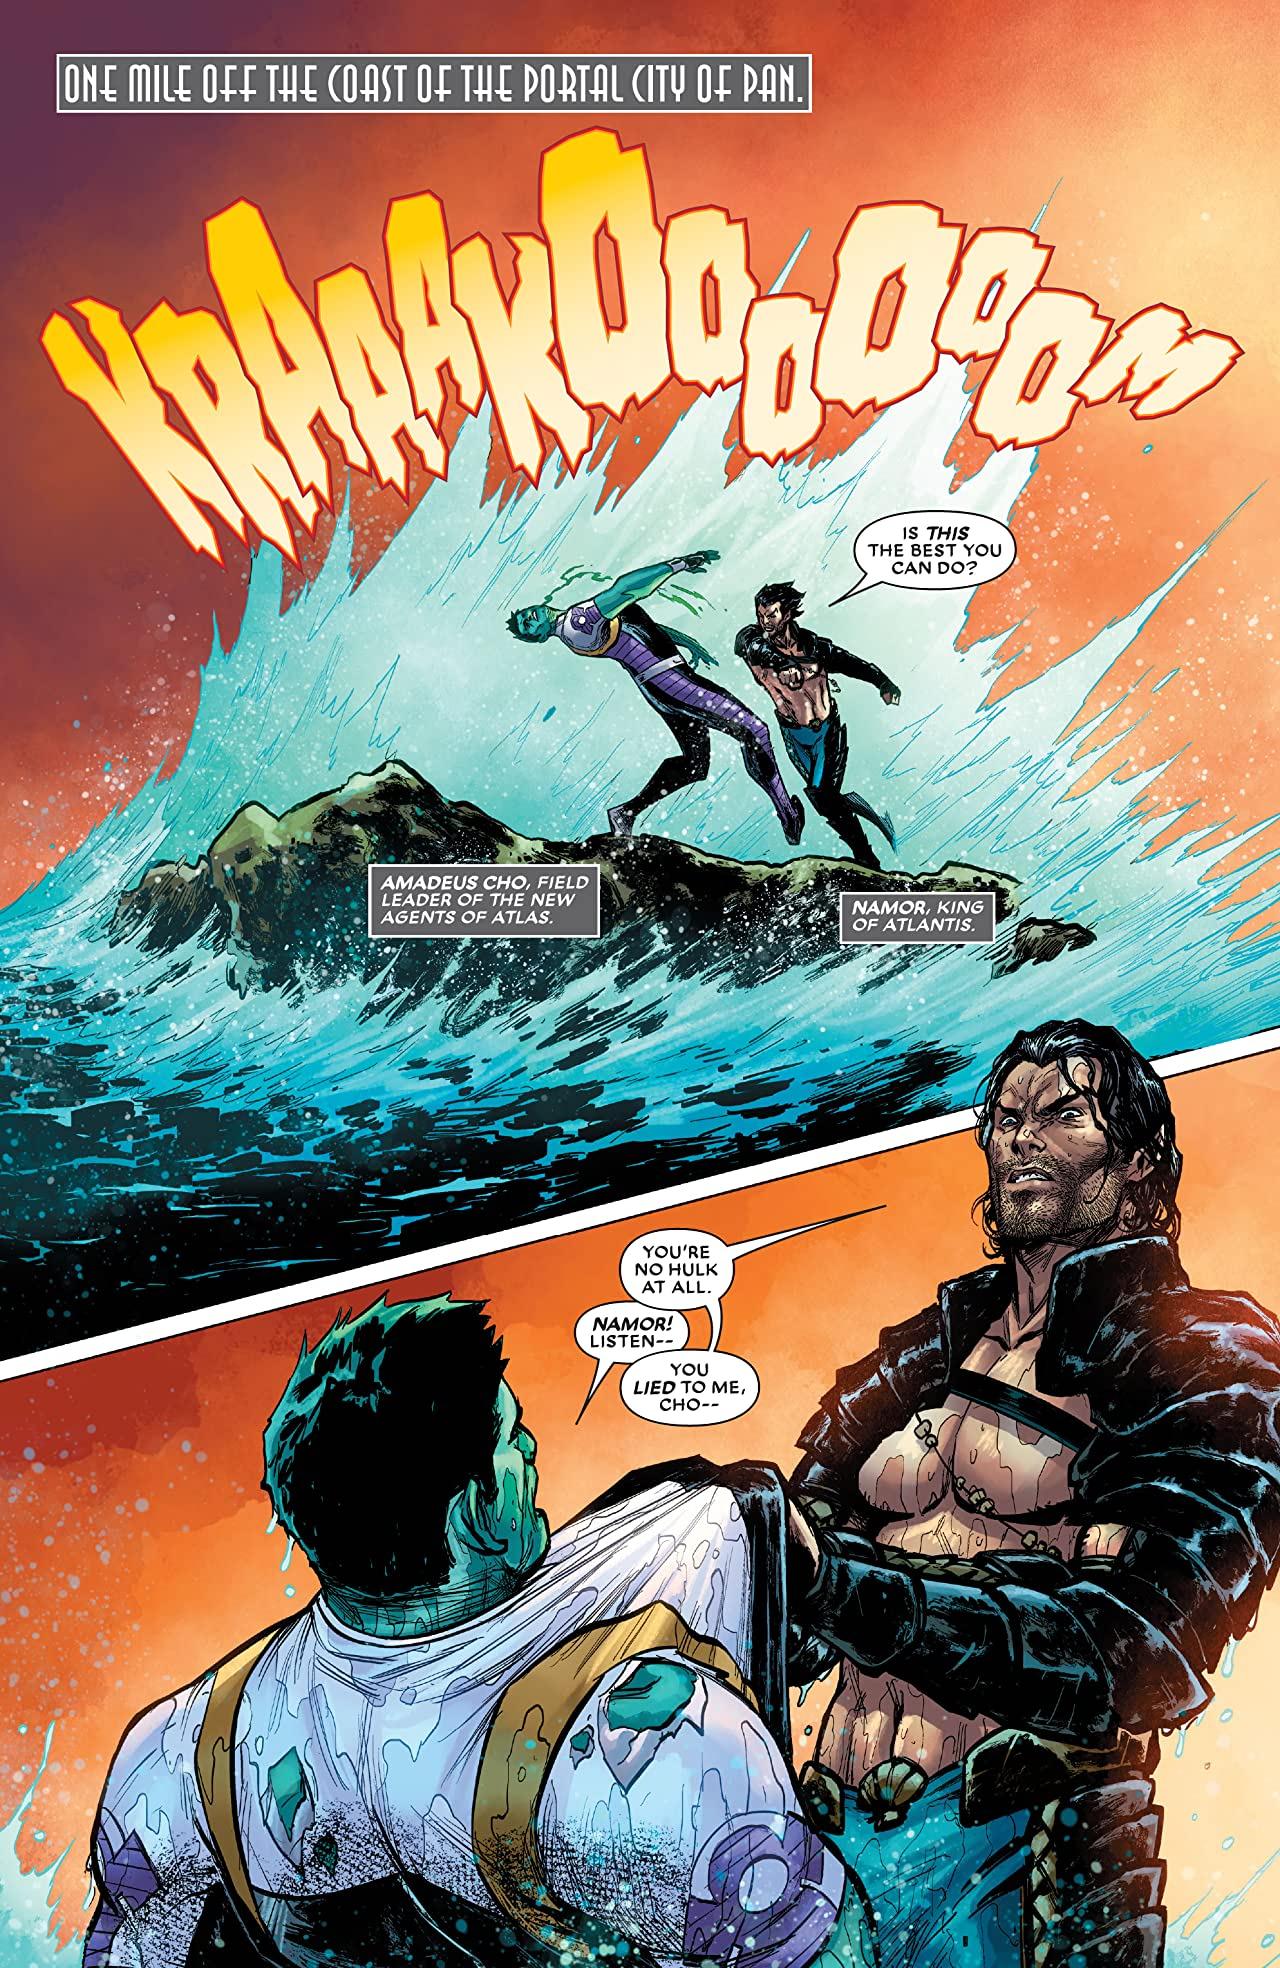 Atlantis Attacks #3 - plansze